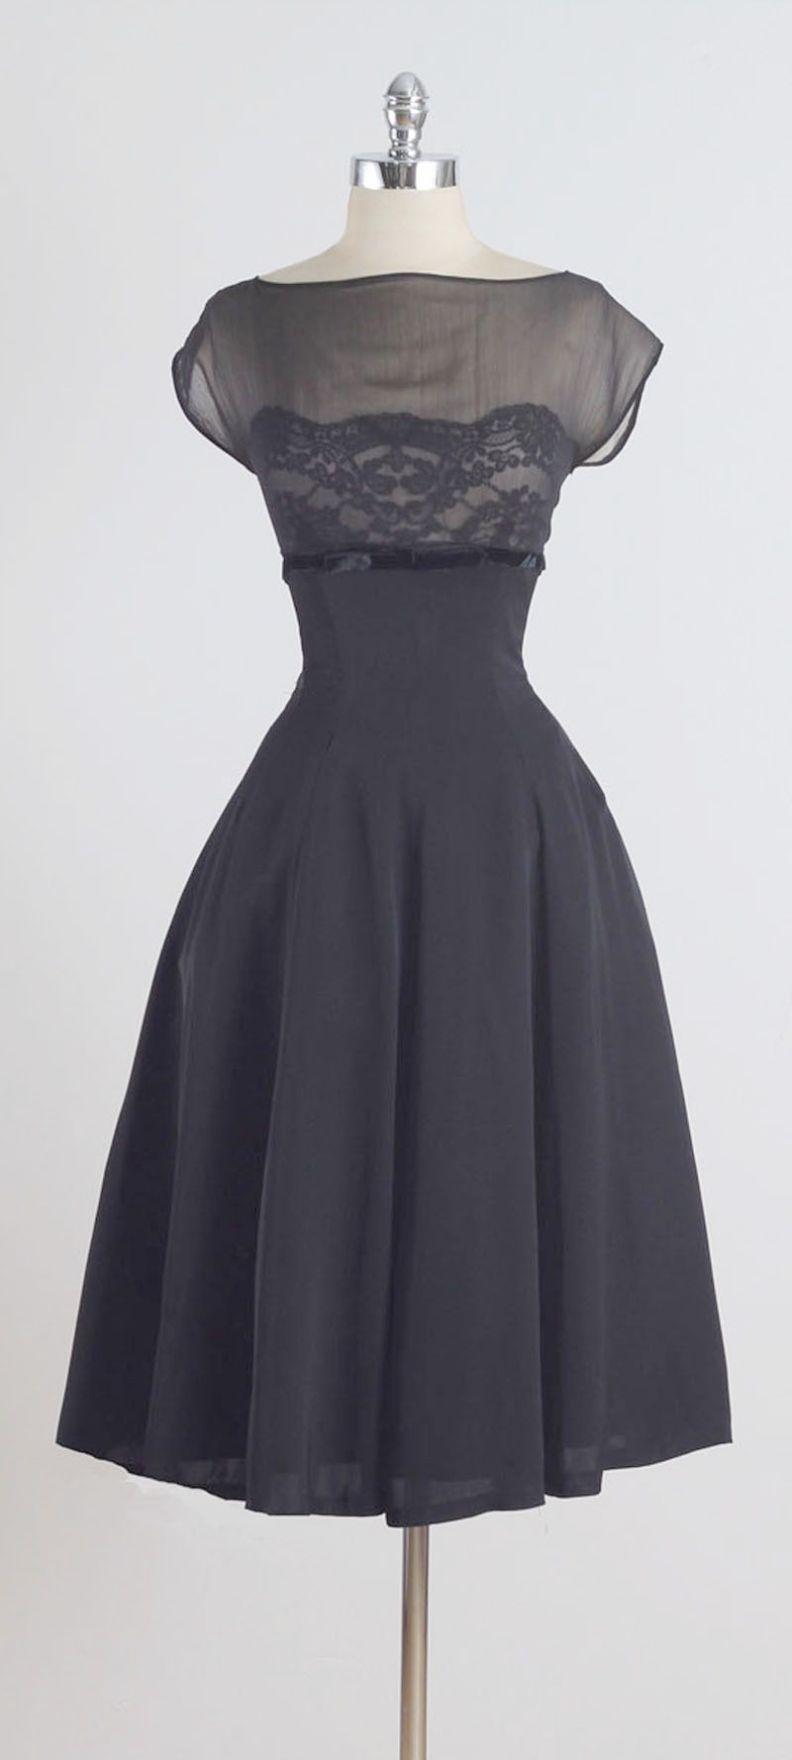 50s Dresses Ebay Australia Vintage Dress Hire London Vintage Dresses Fashion Vintage Outfits